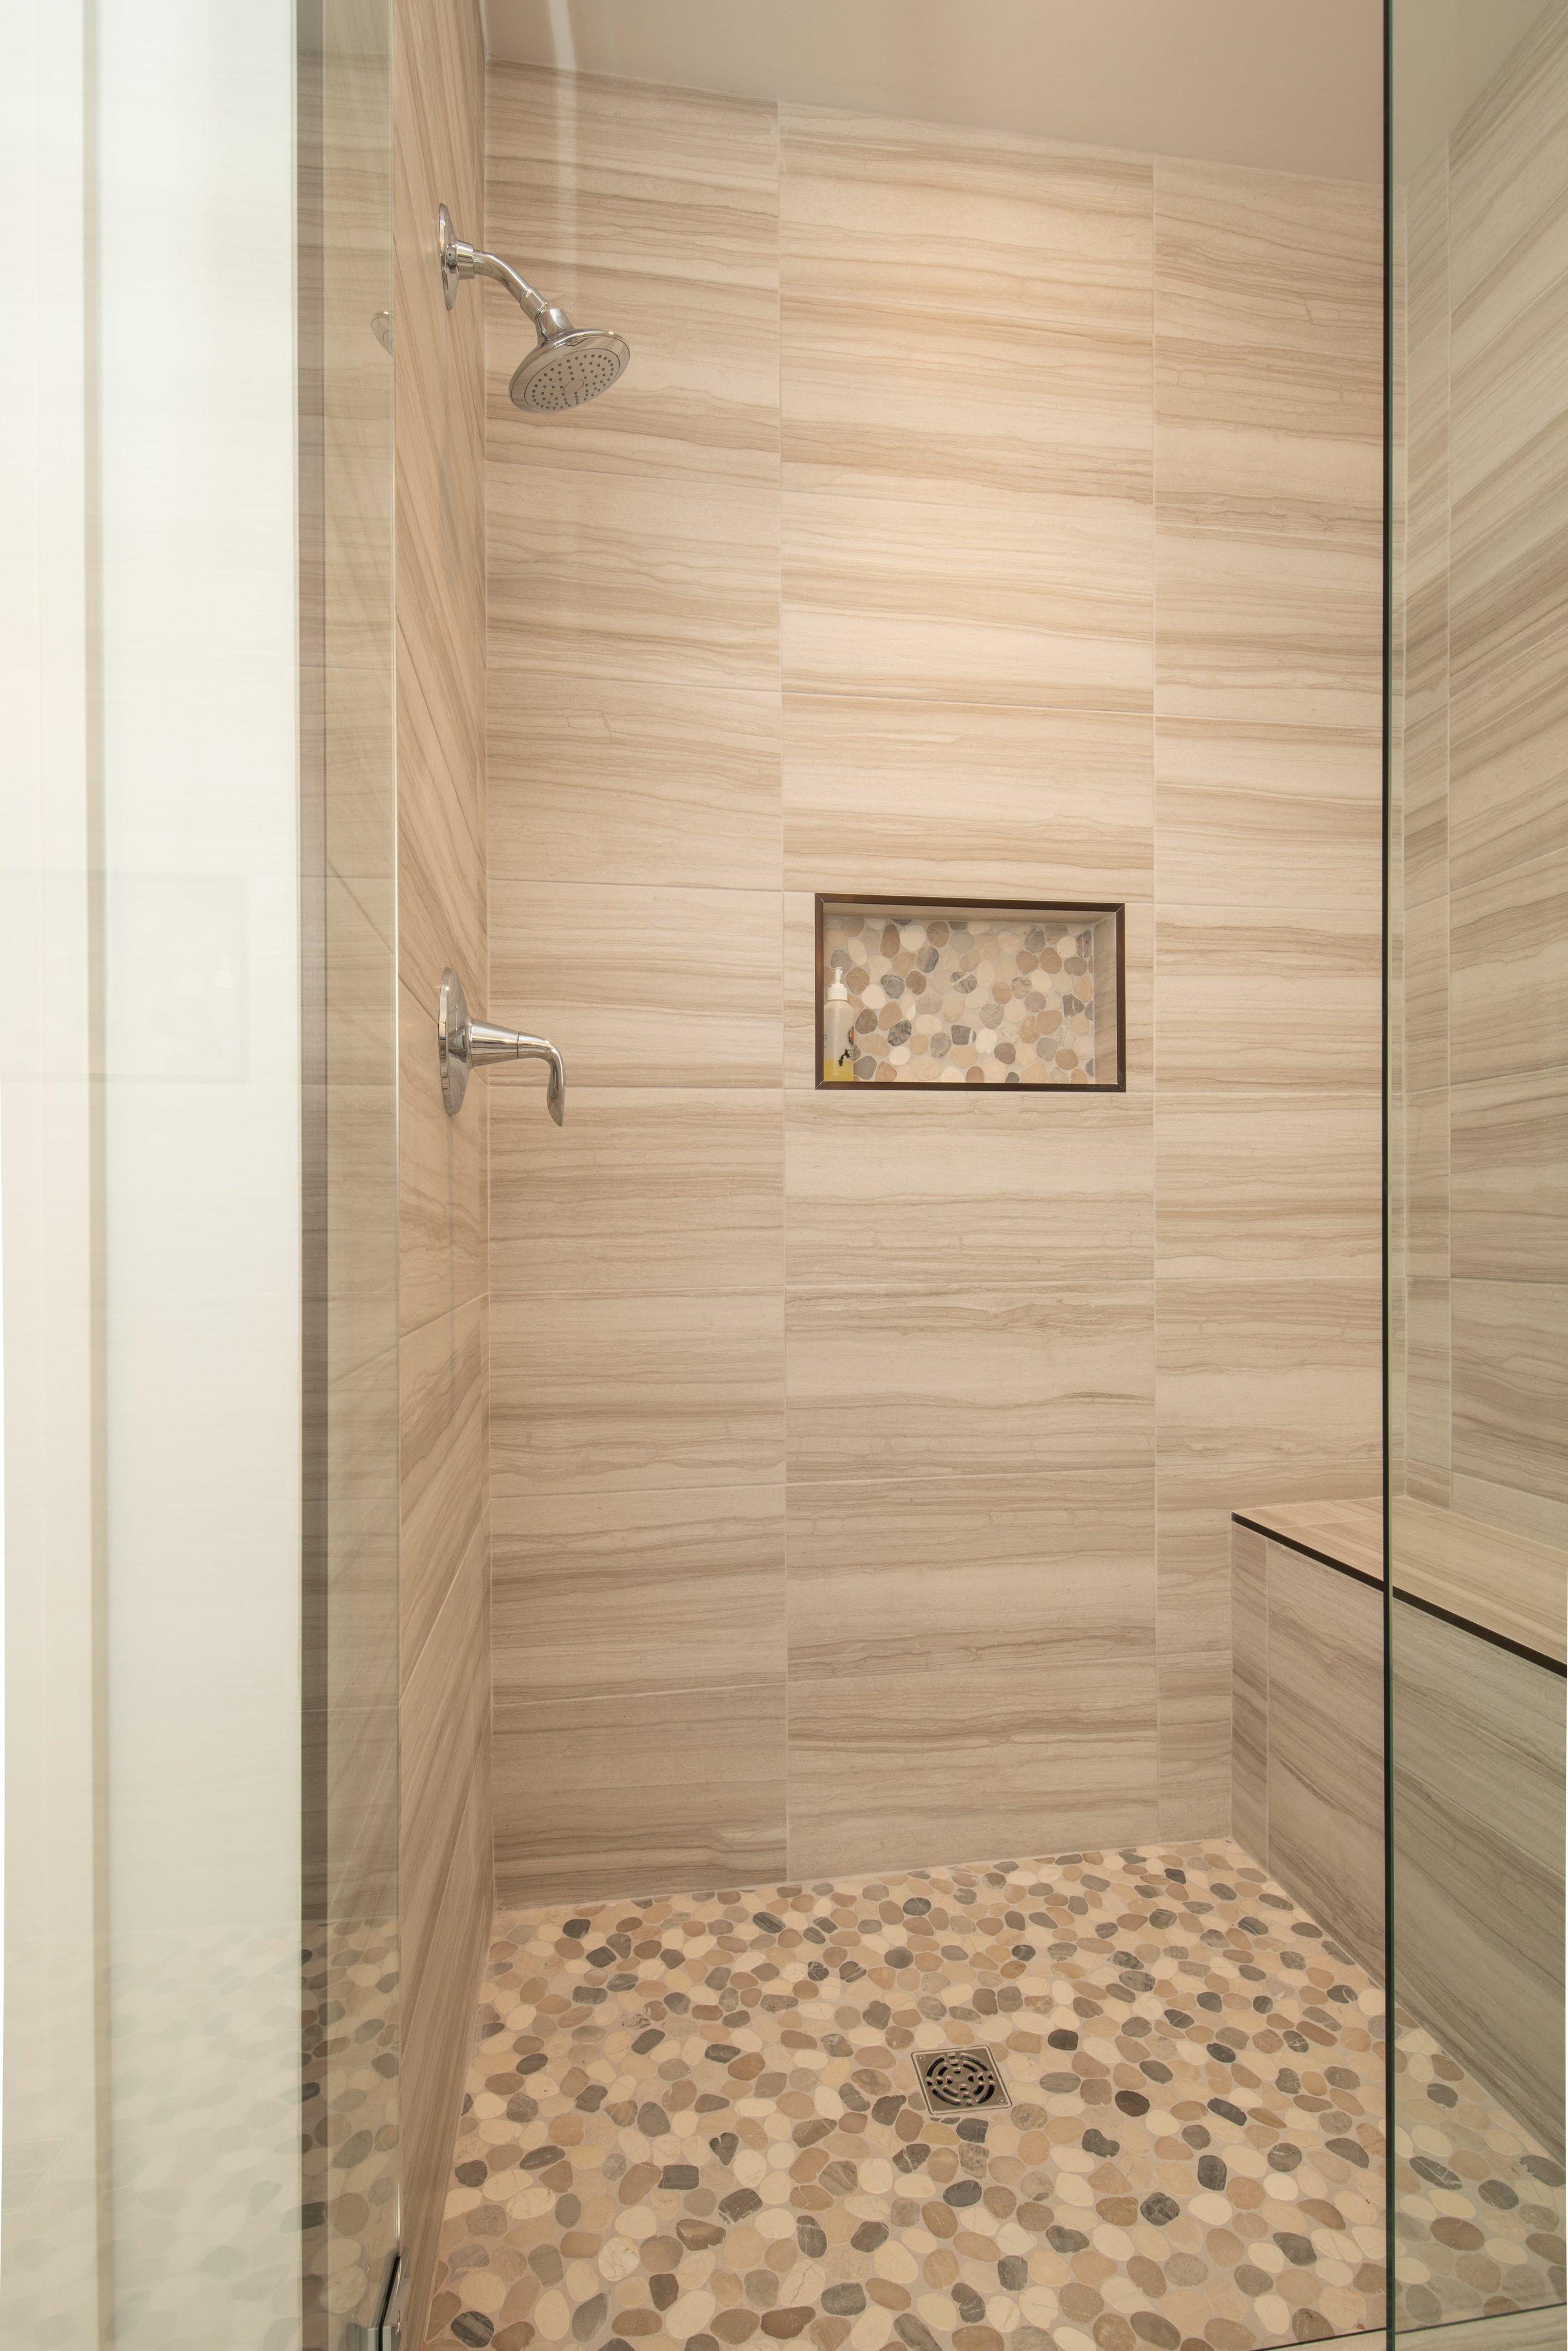 WW-04-110_Foxglove_Owner's Bath_shower-min.jpg